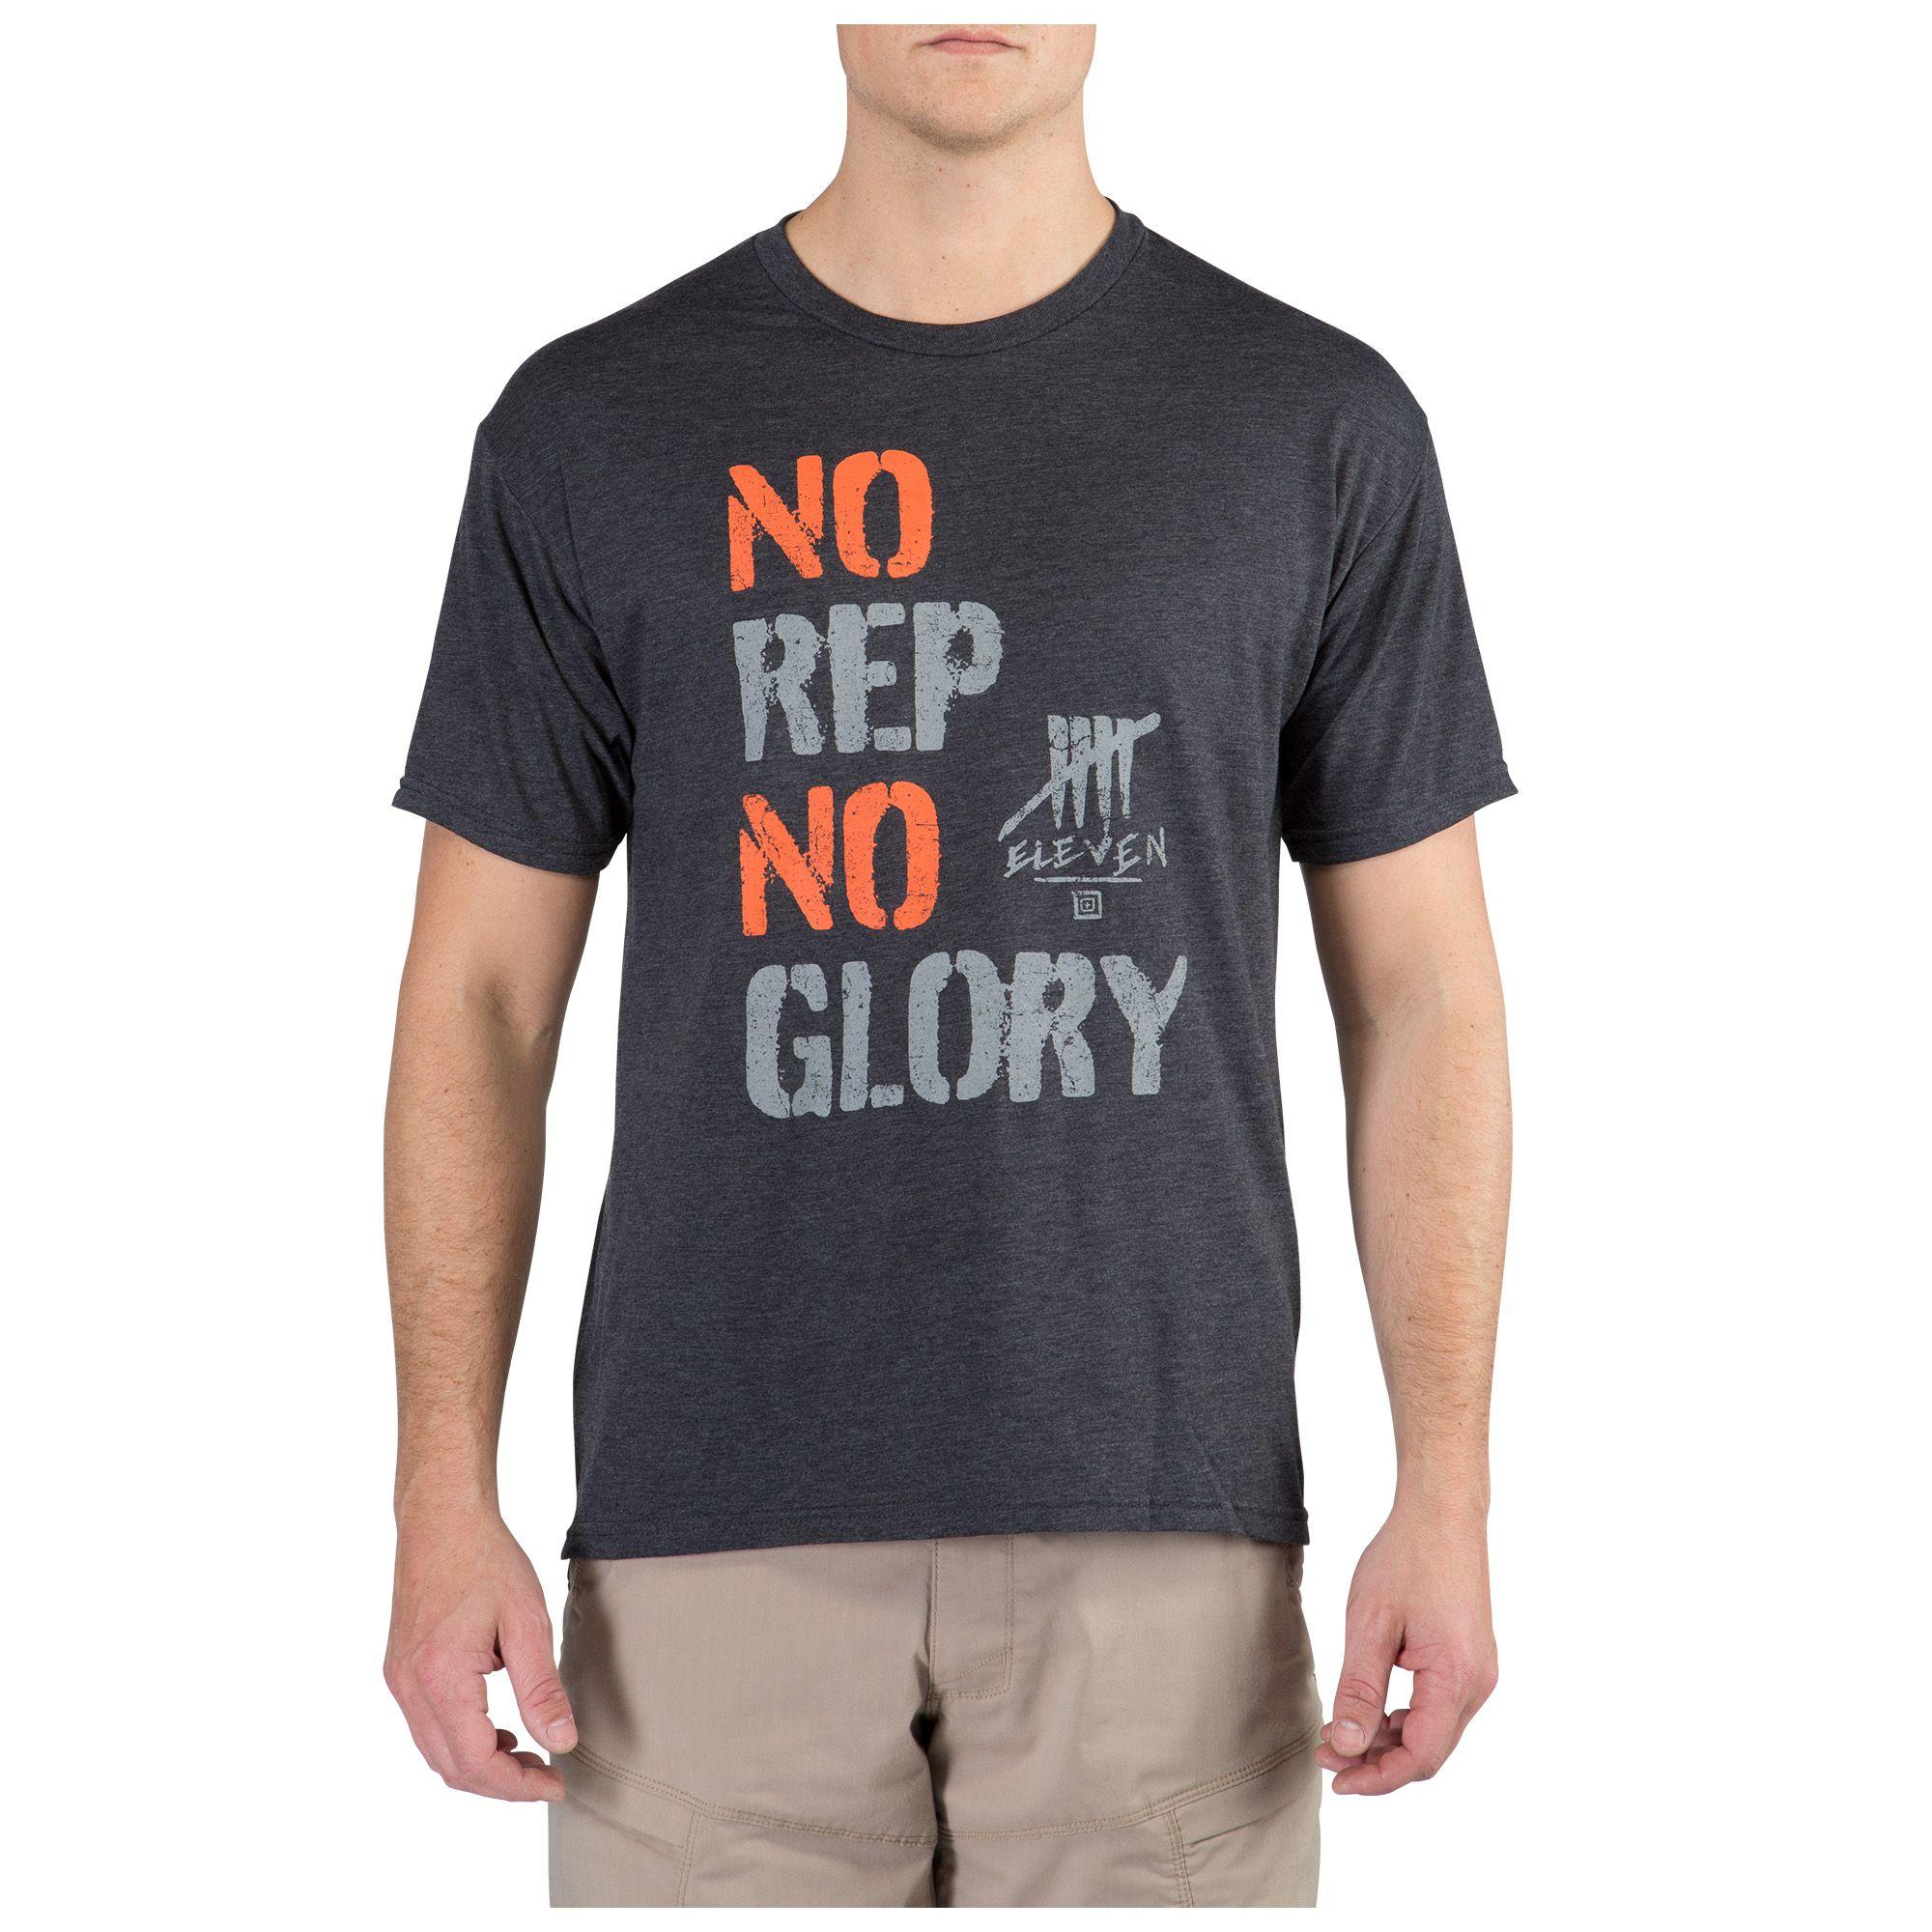 NO REP NO GLORY TEE